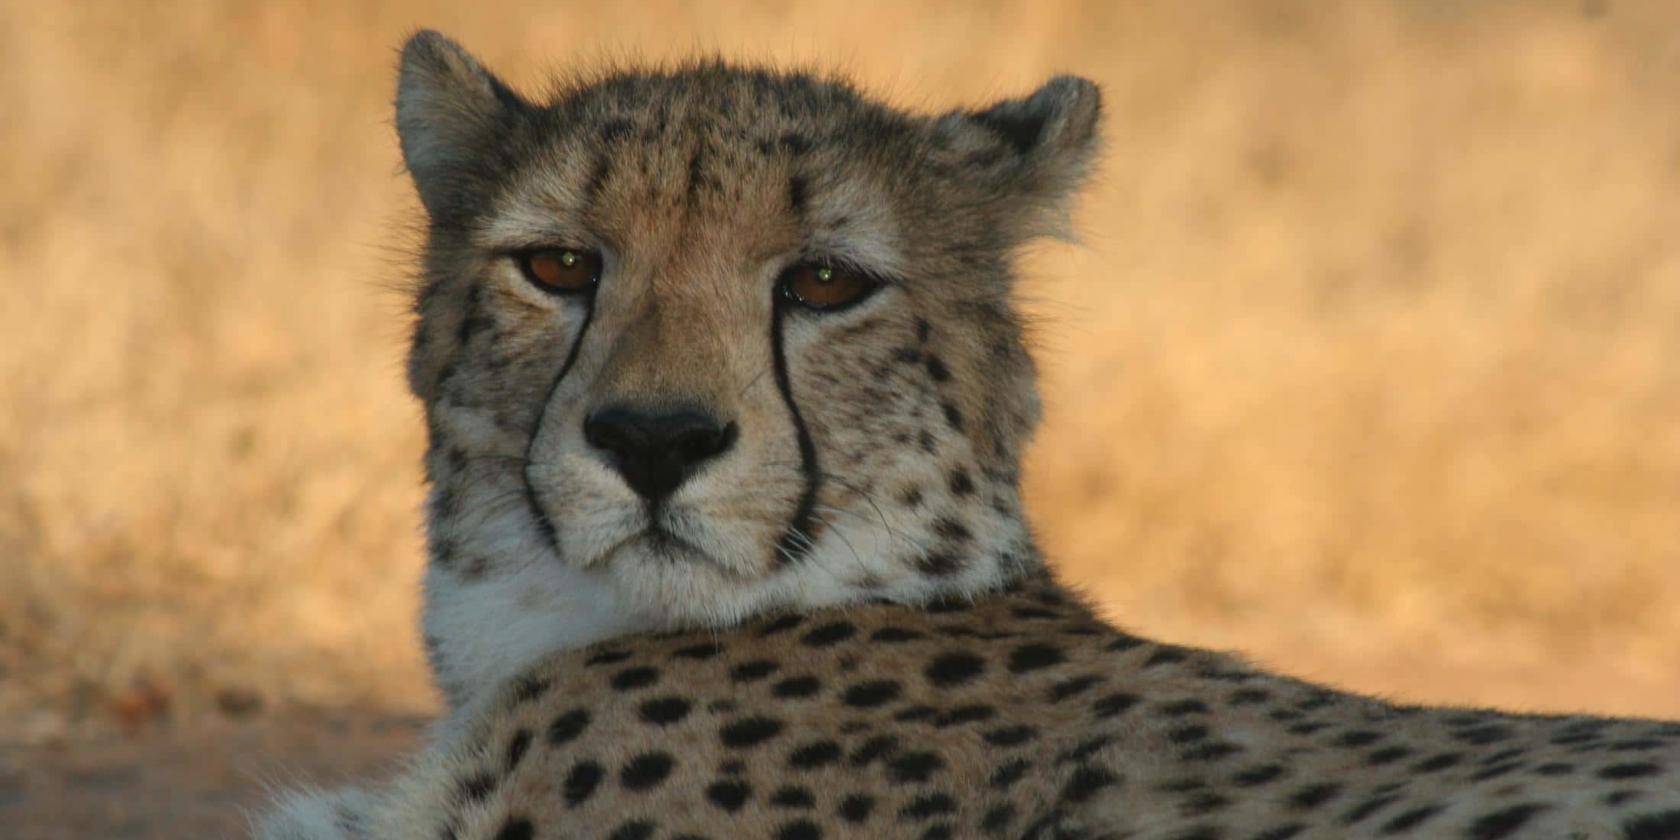 Kruger National Park - Cheetah close-up